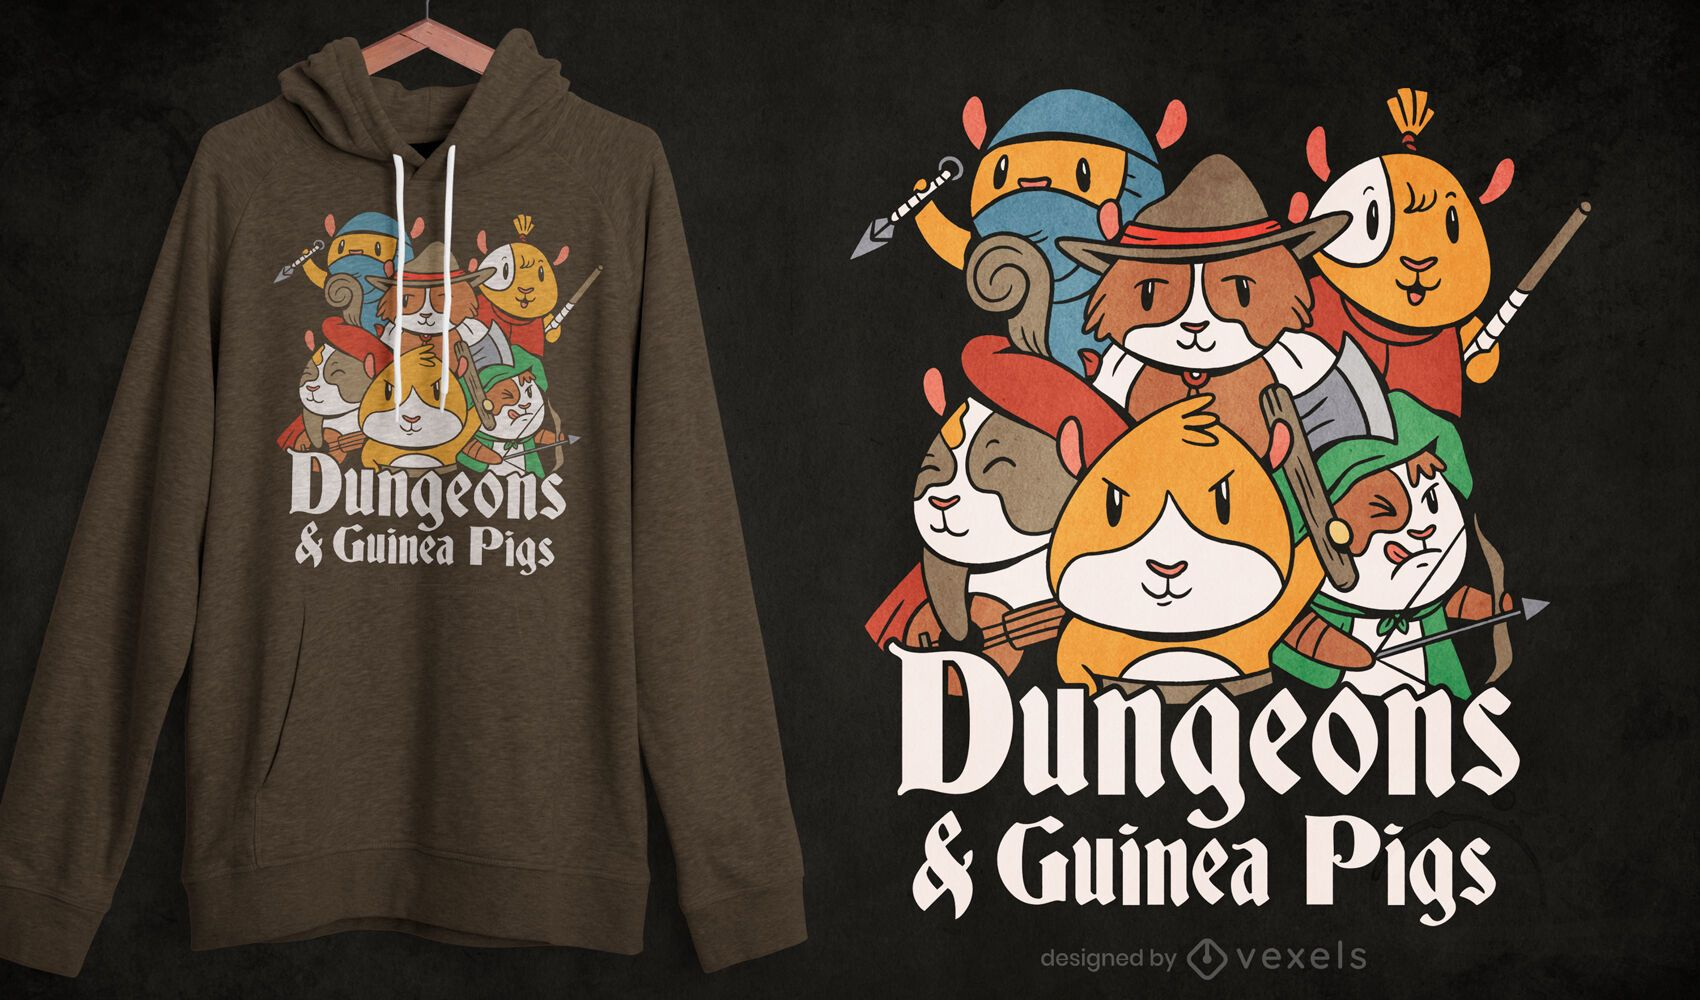 Dungeon guinea pigs t-shirt design